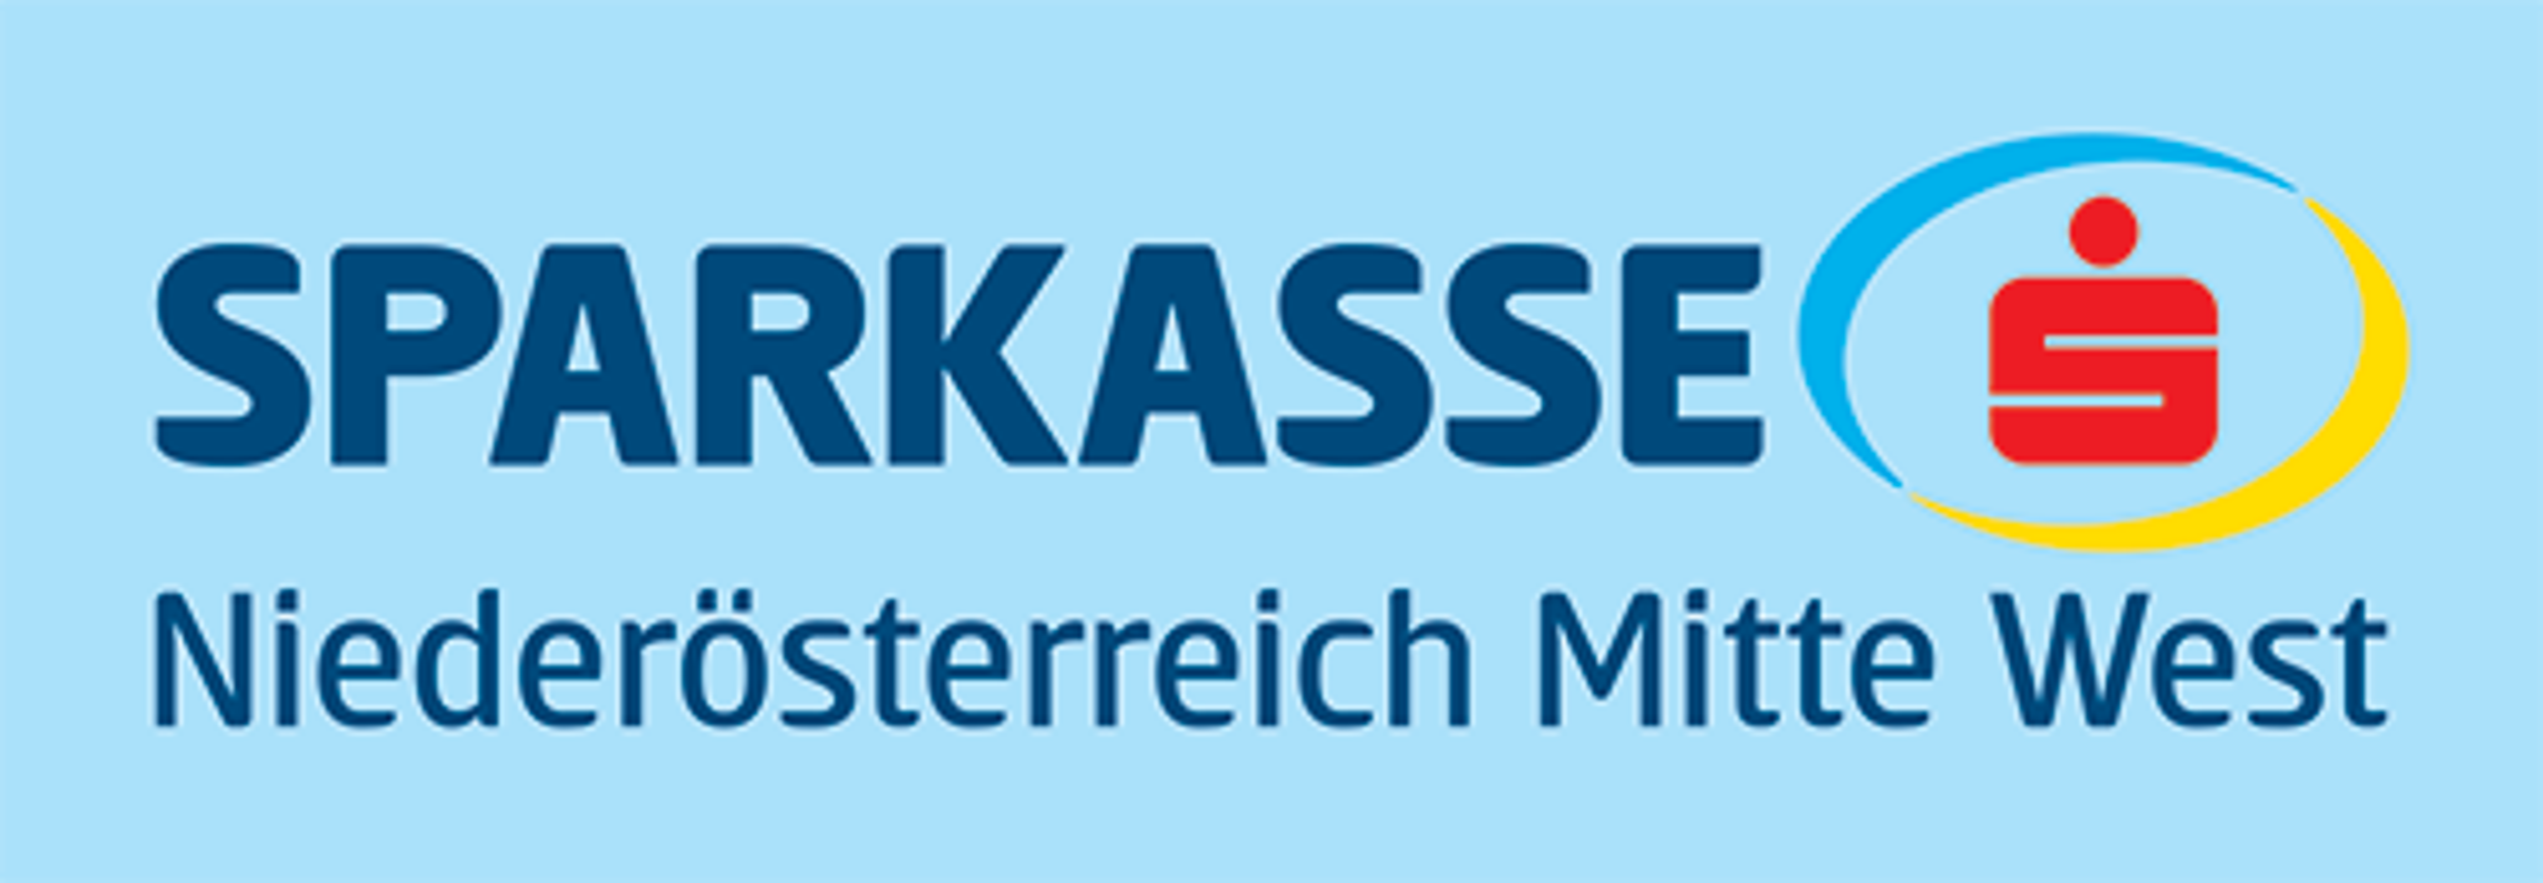 Logo Sparkasse NÖ Mitte West hellblau